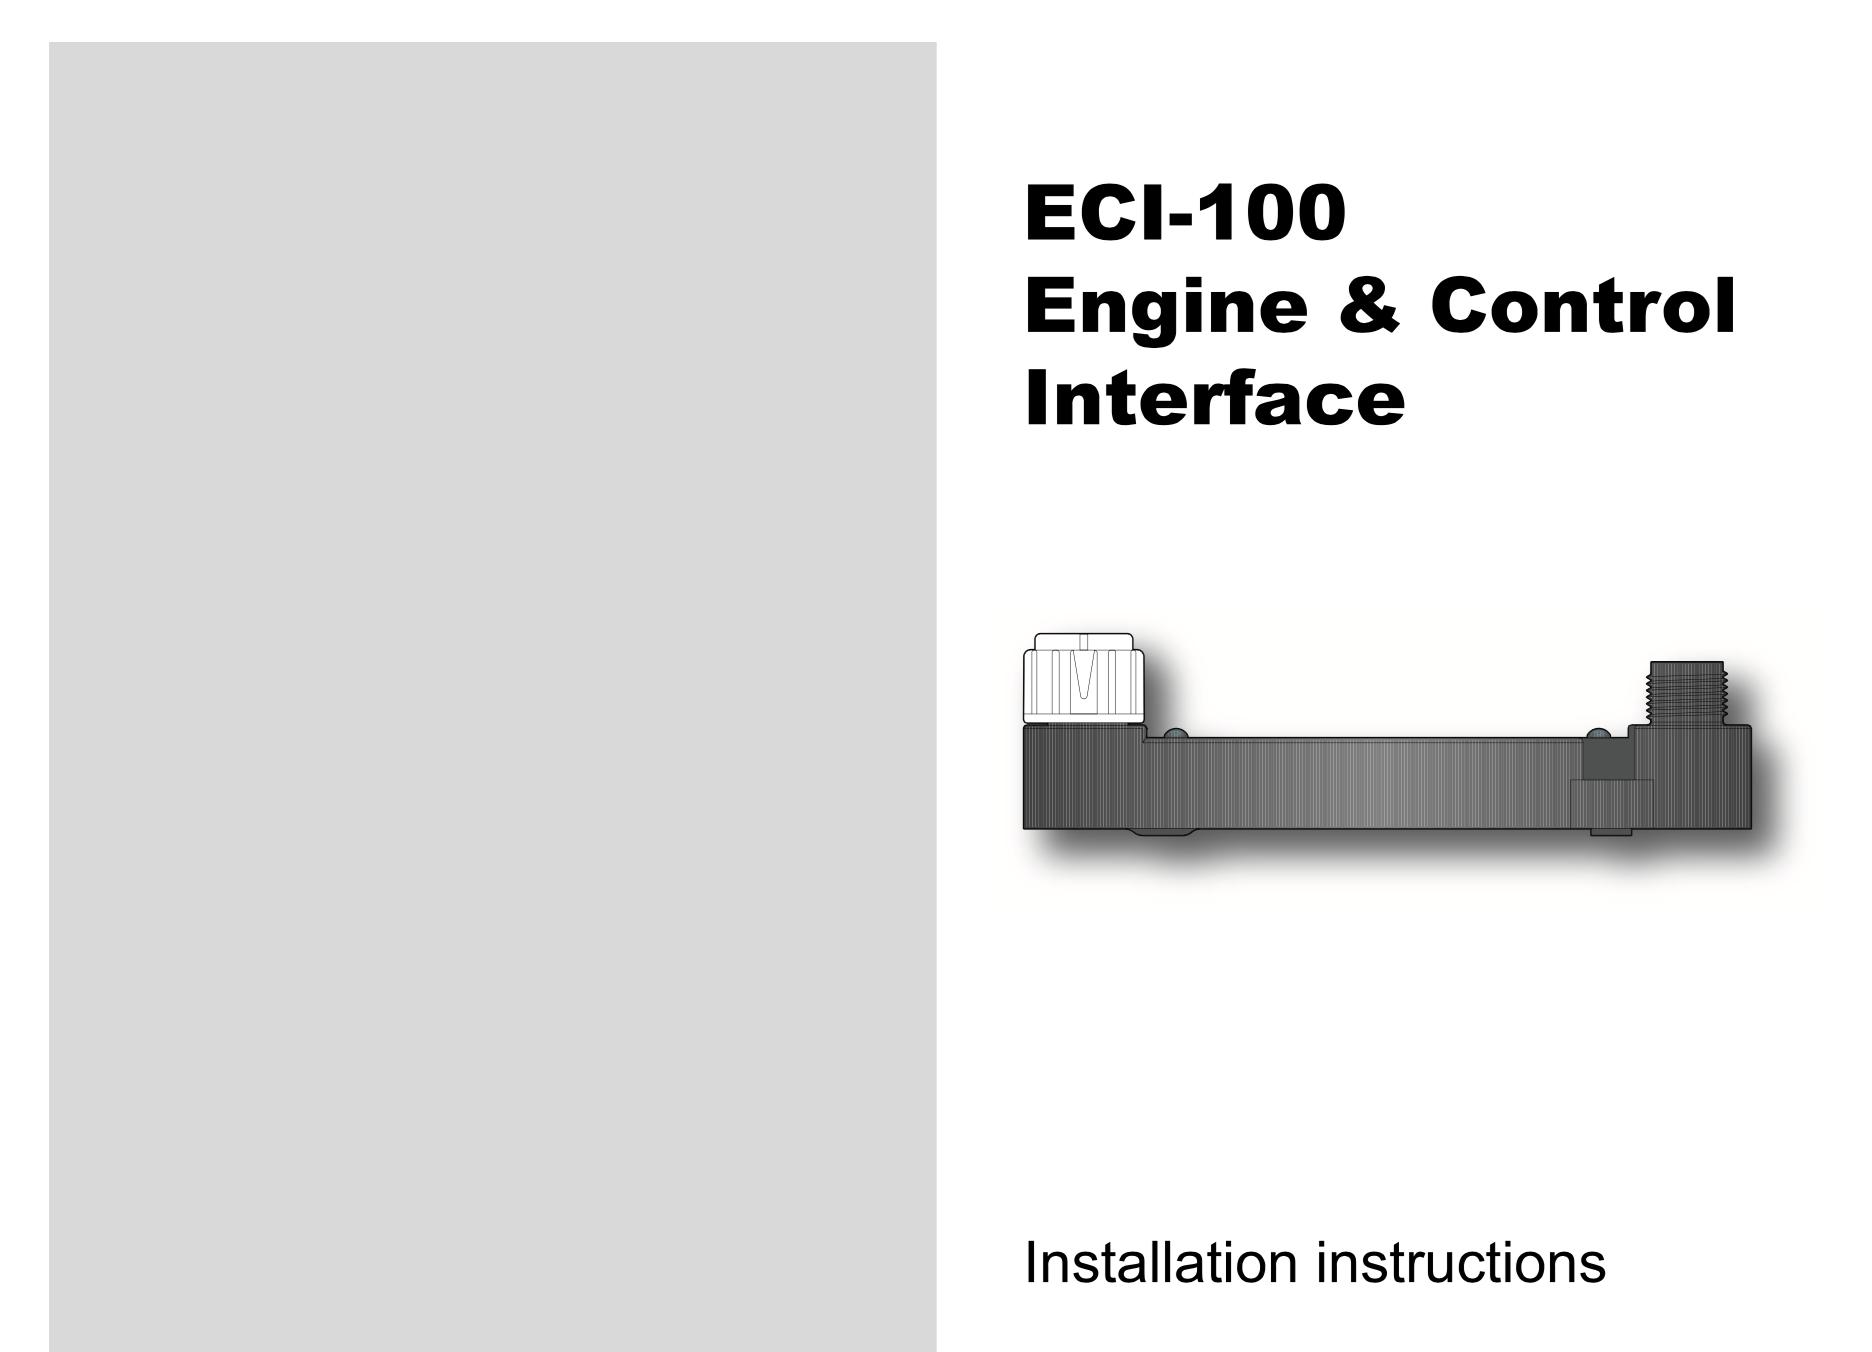 eci-100 engine control interface installation instructions